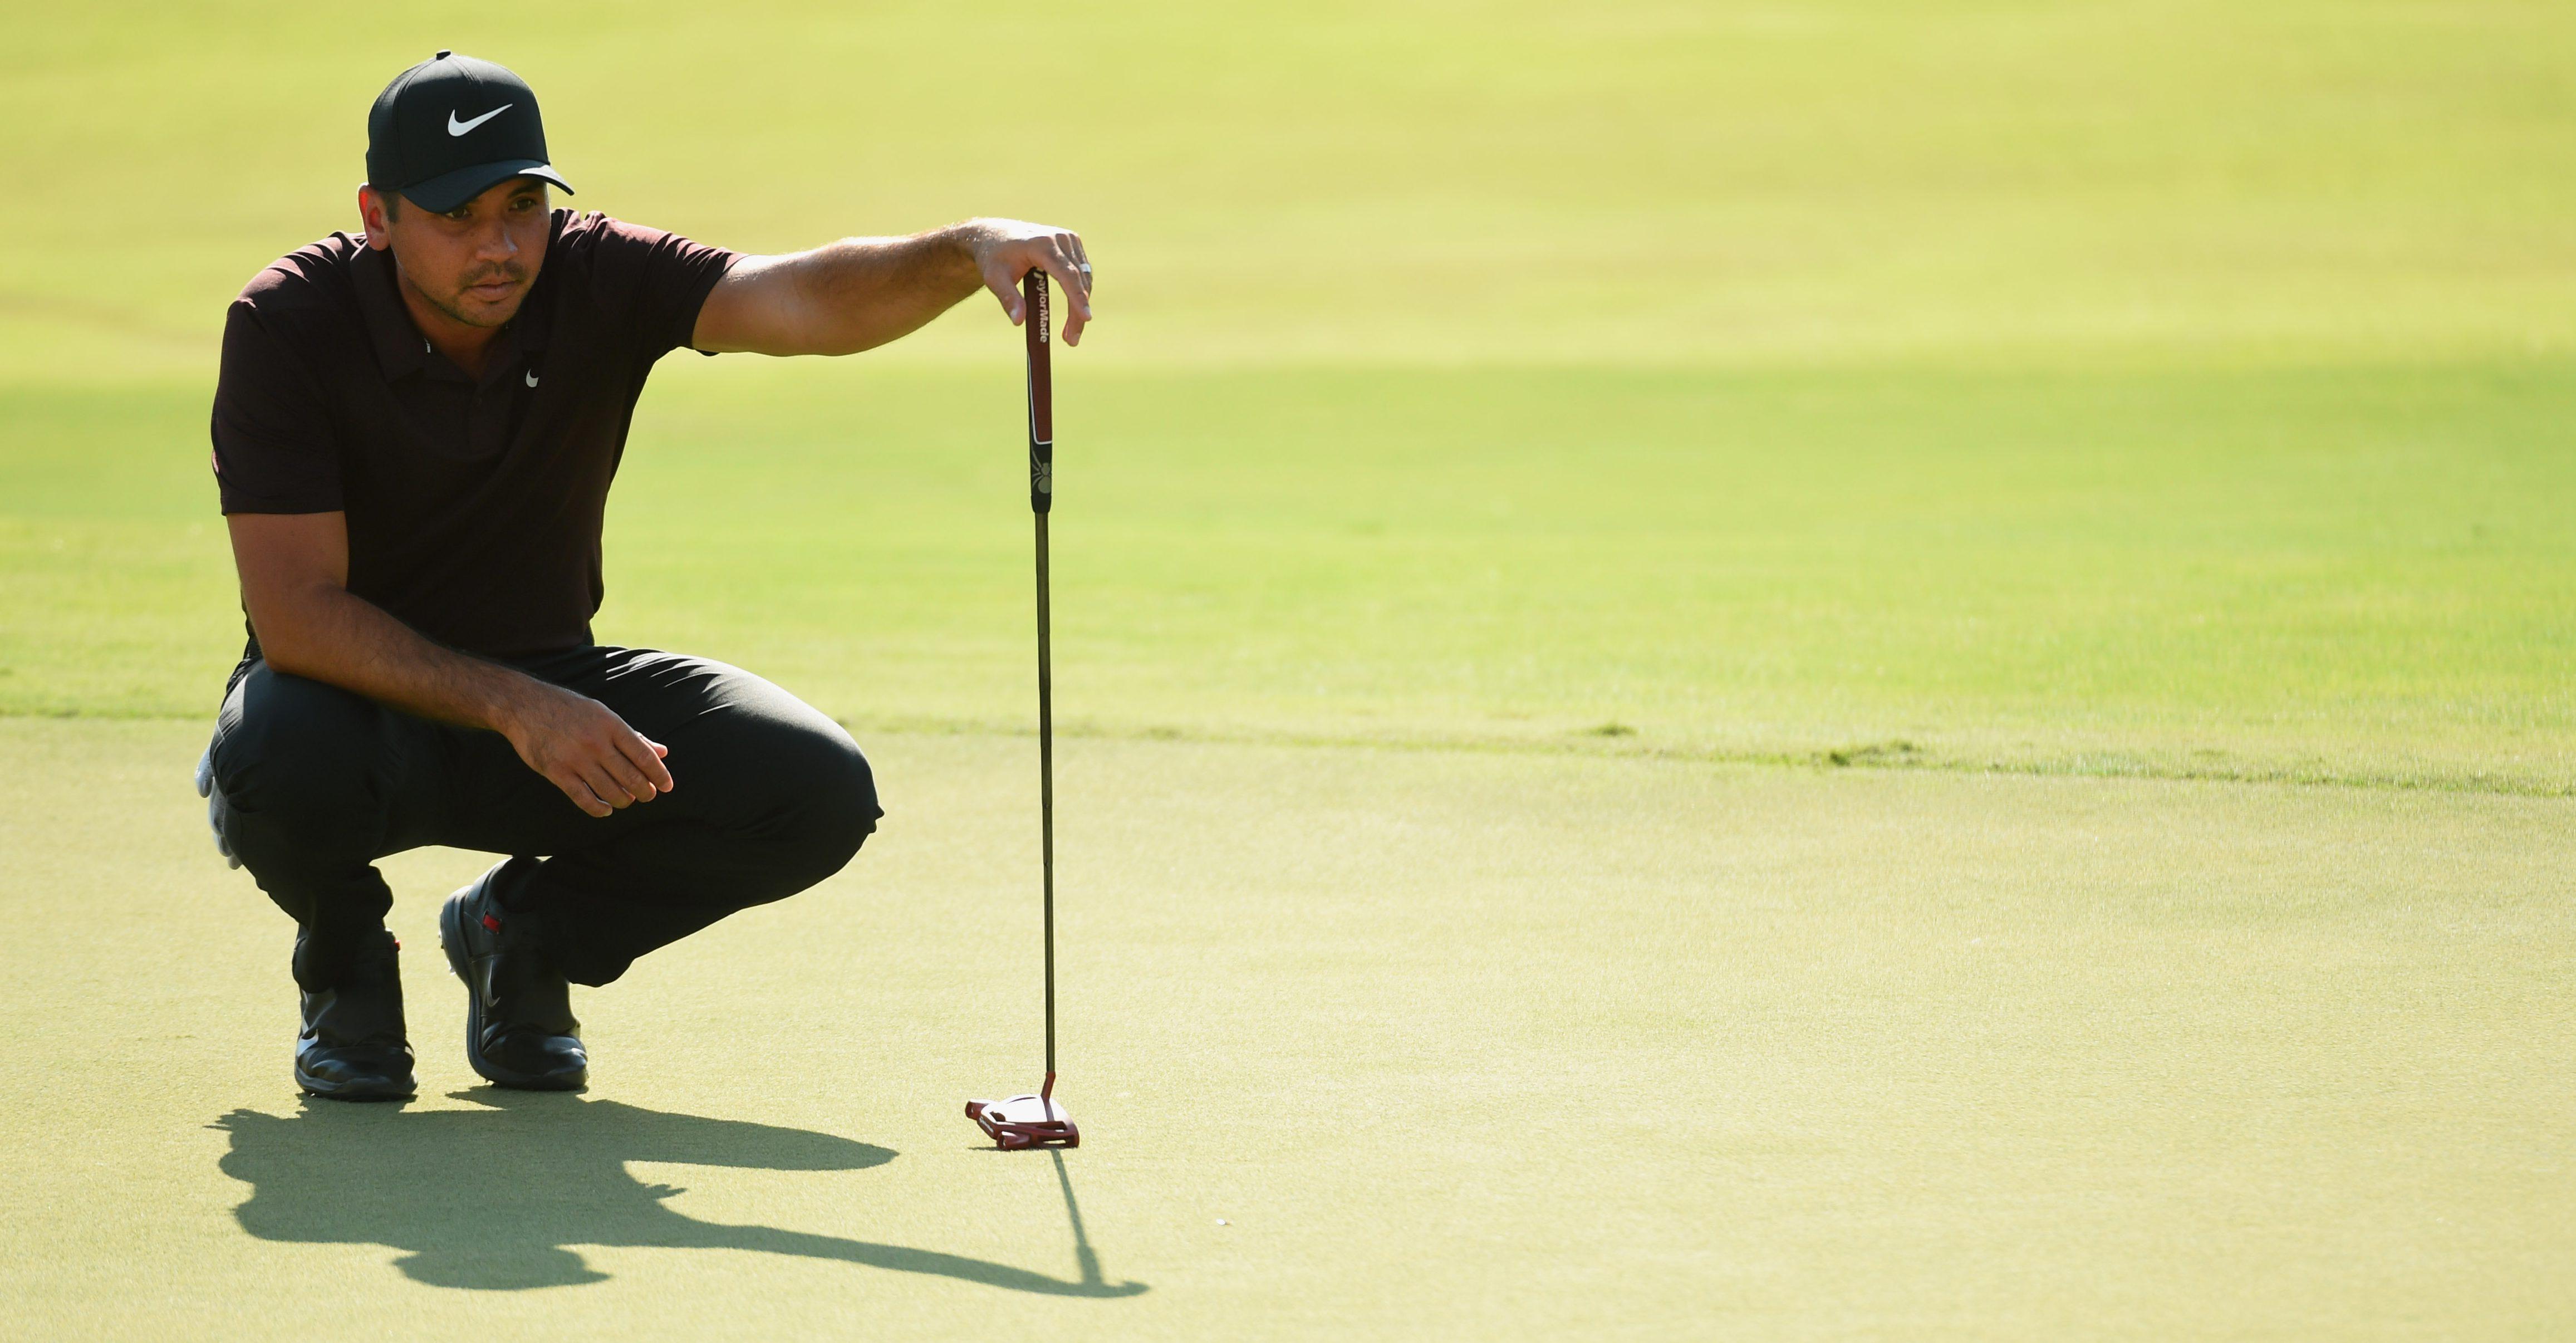 Sep 21, 2018; Atlanta, GA, USA; Jason Day on the 18th green during Tour Championship golf tournament at East Lake Golf Club. Mandatory Credit: John David Mercer-USA TODAY Sports